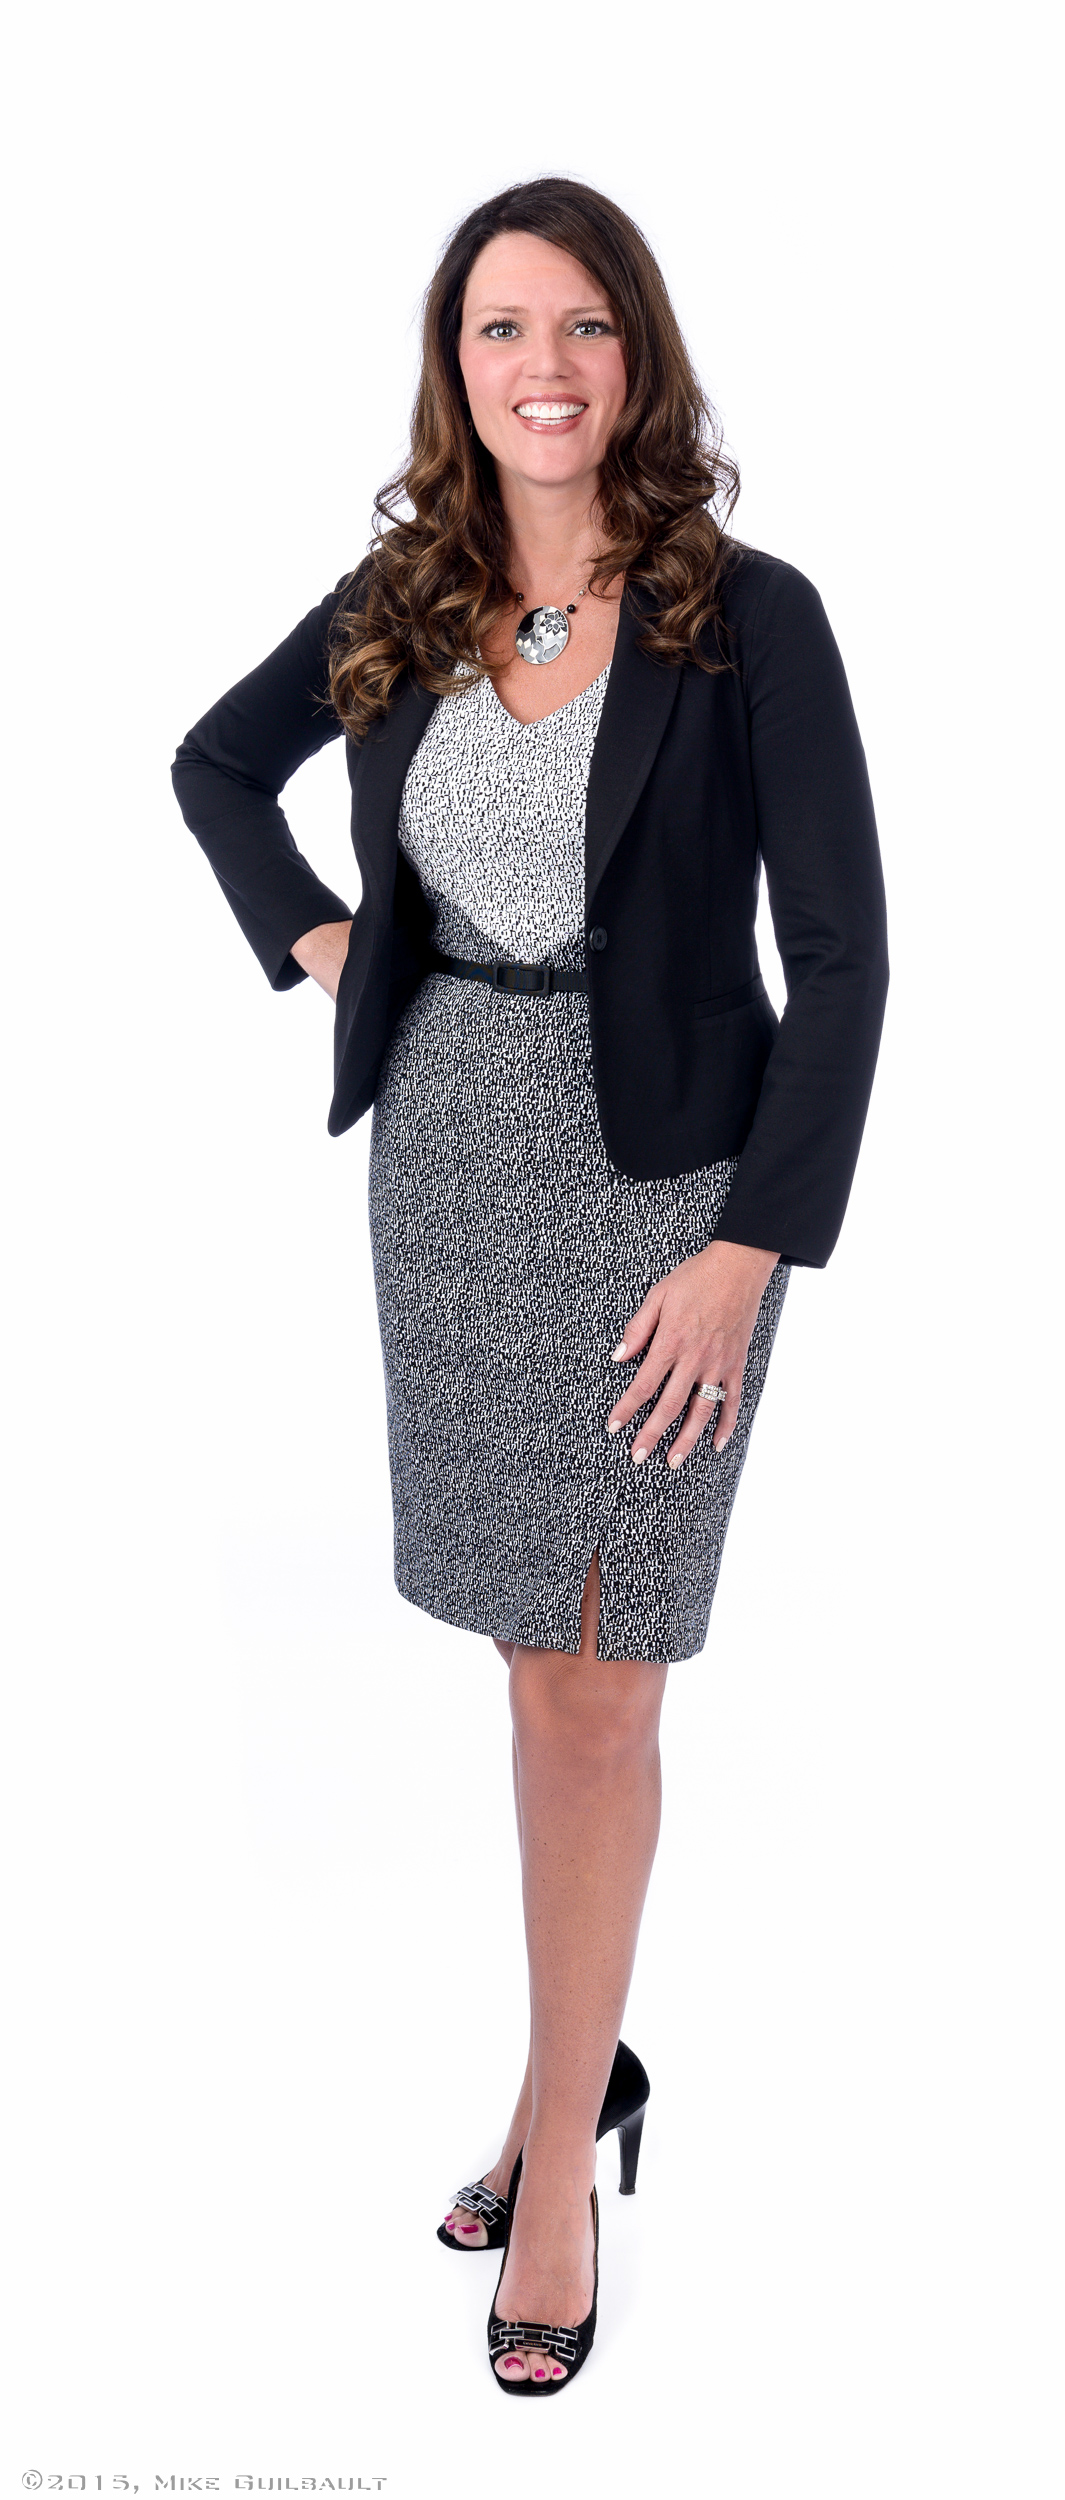 Full Length Business Portrait on White Seamless Background